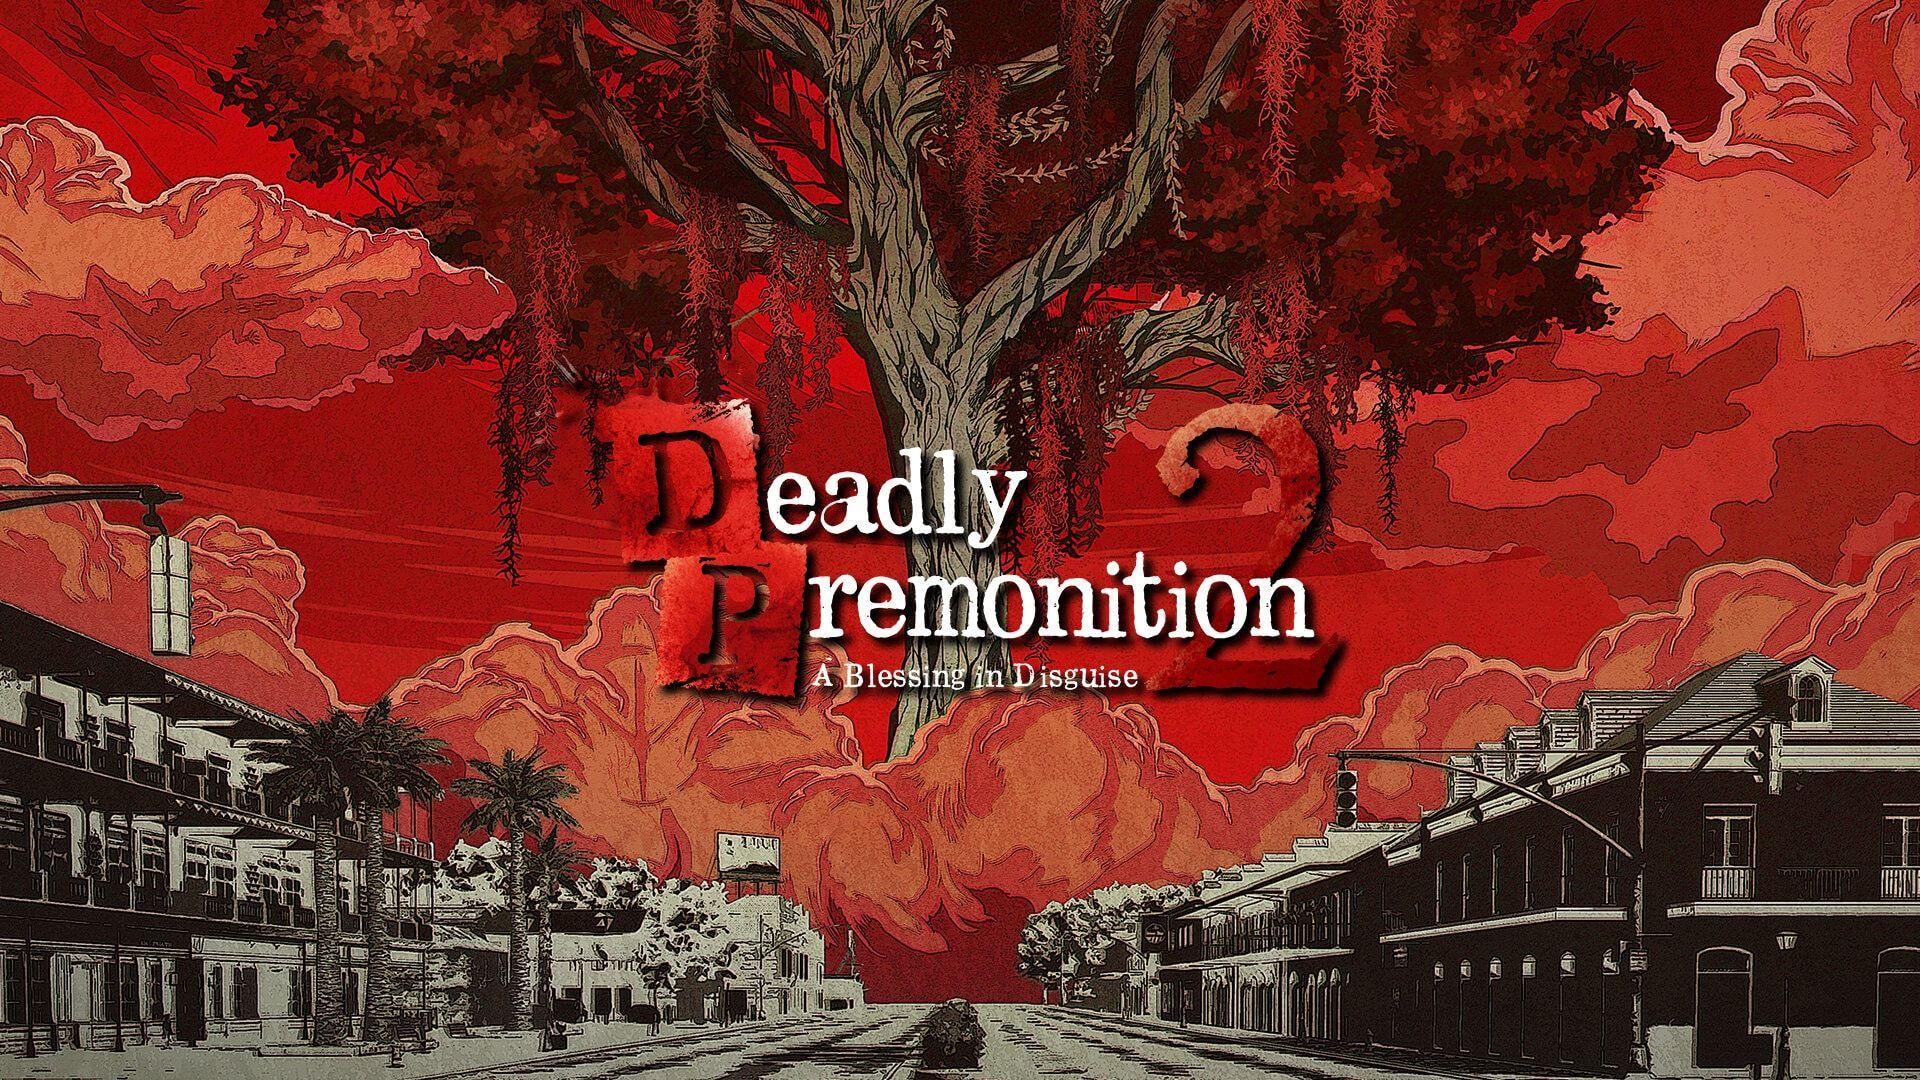 Deadly Premonition 2: A Blessing In Disguise эмулируется на PC при помощи Yuzu